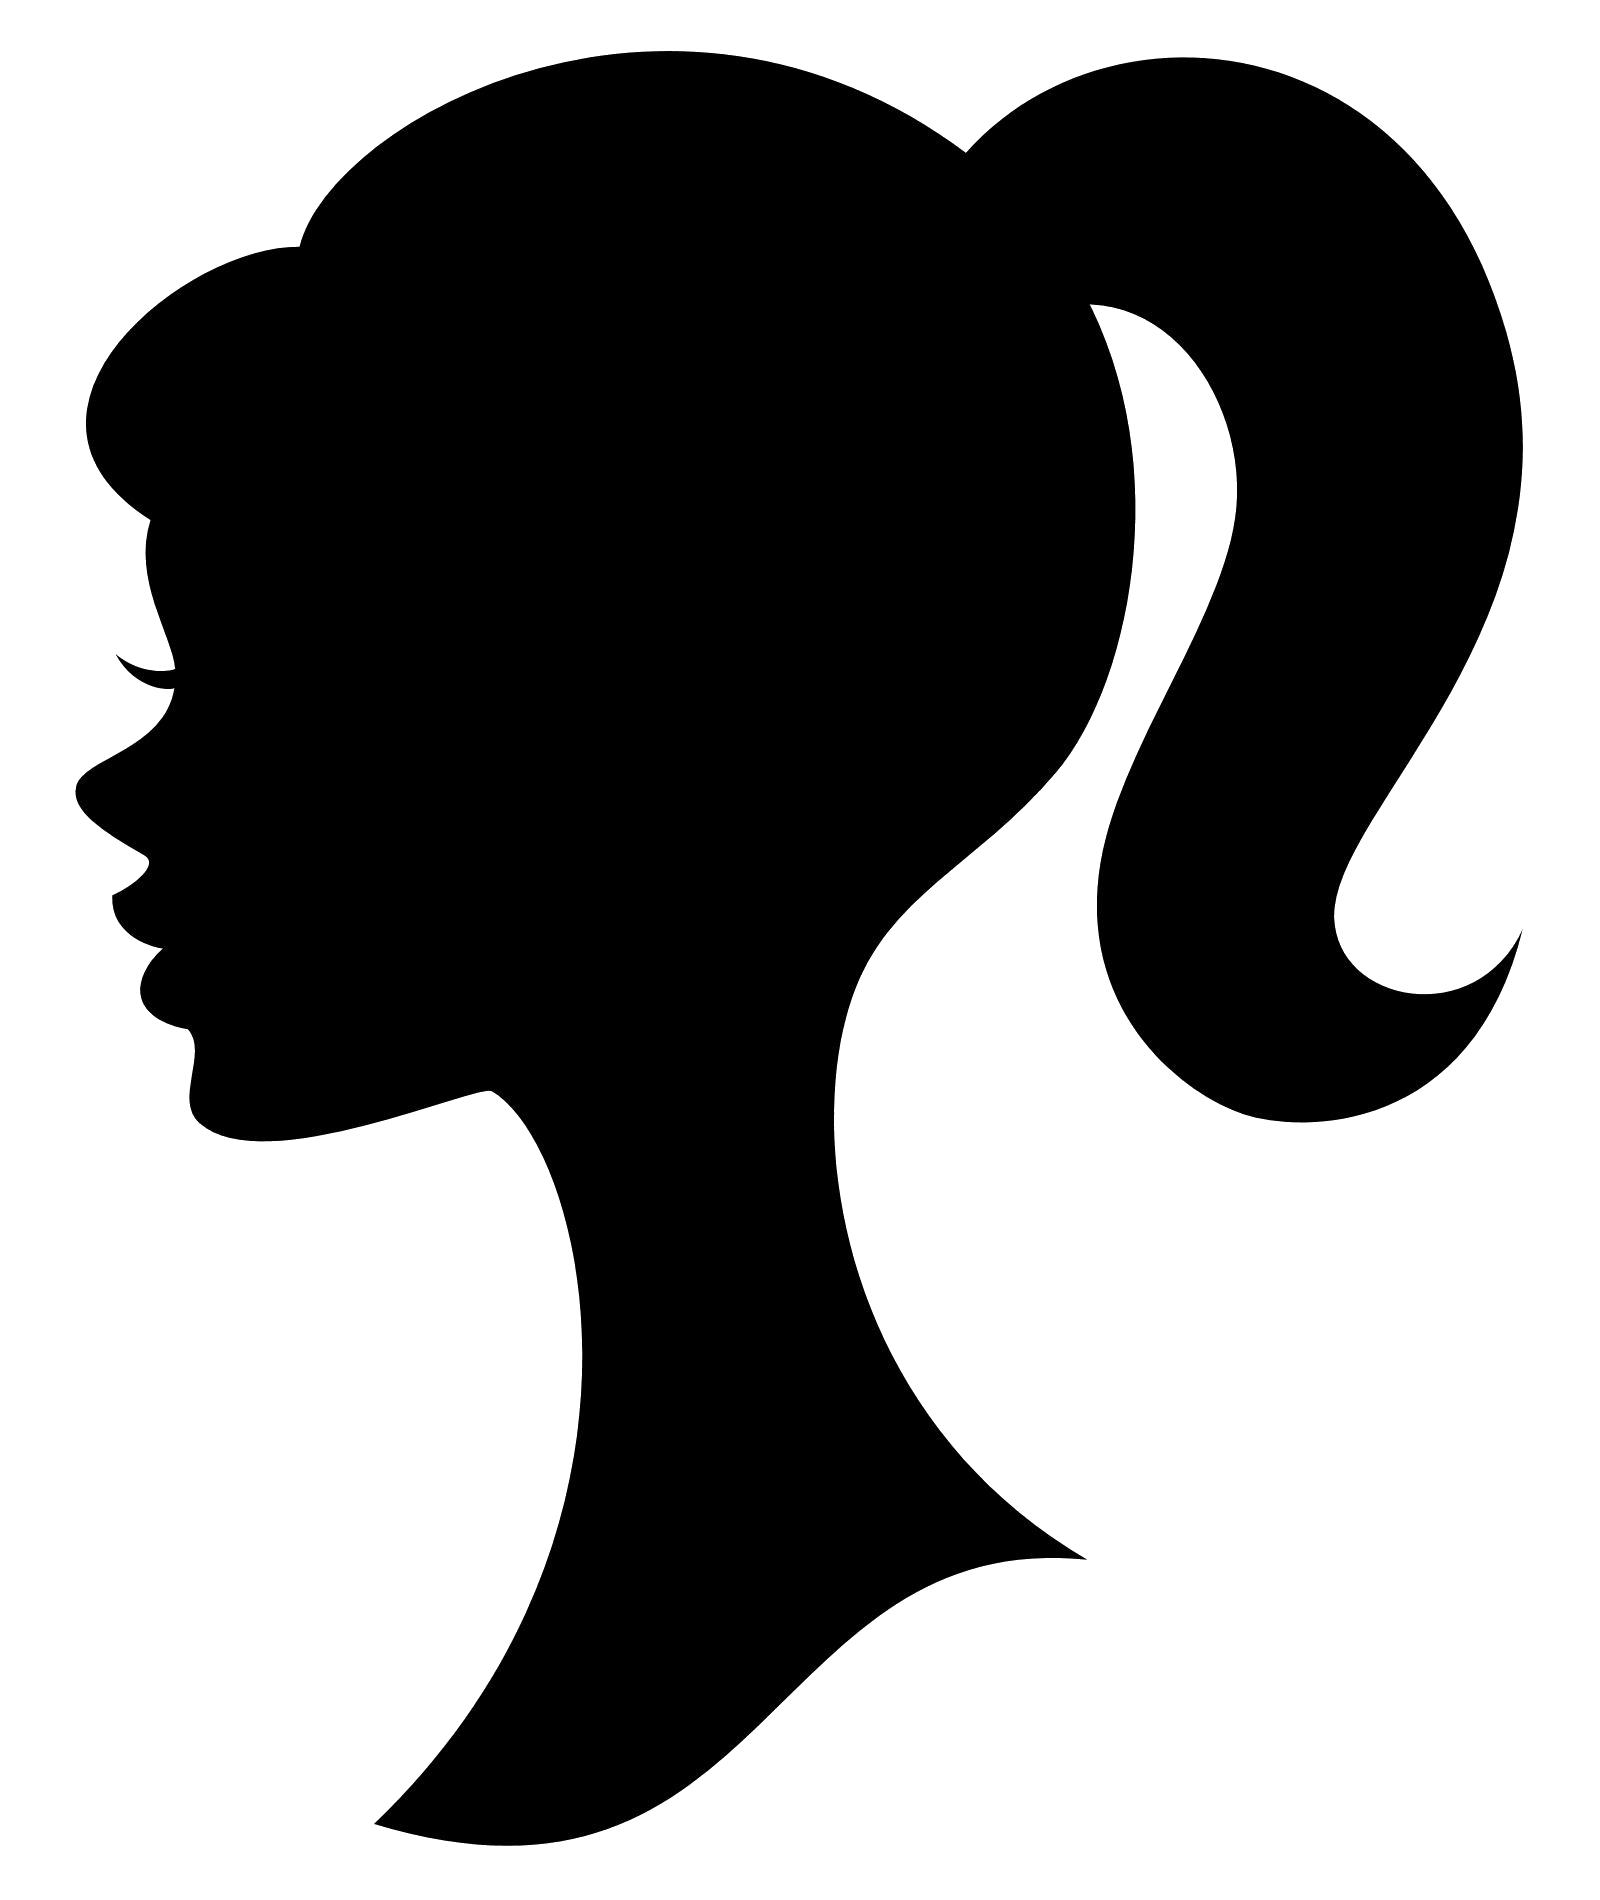 Image of Barbie Clipart #4055, Cartoon Mermaid Clipart Free Clip.